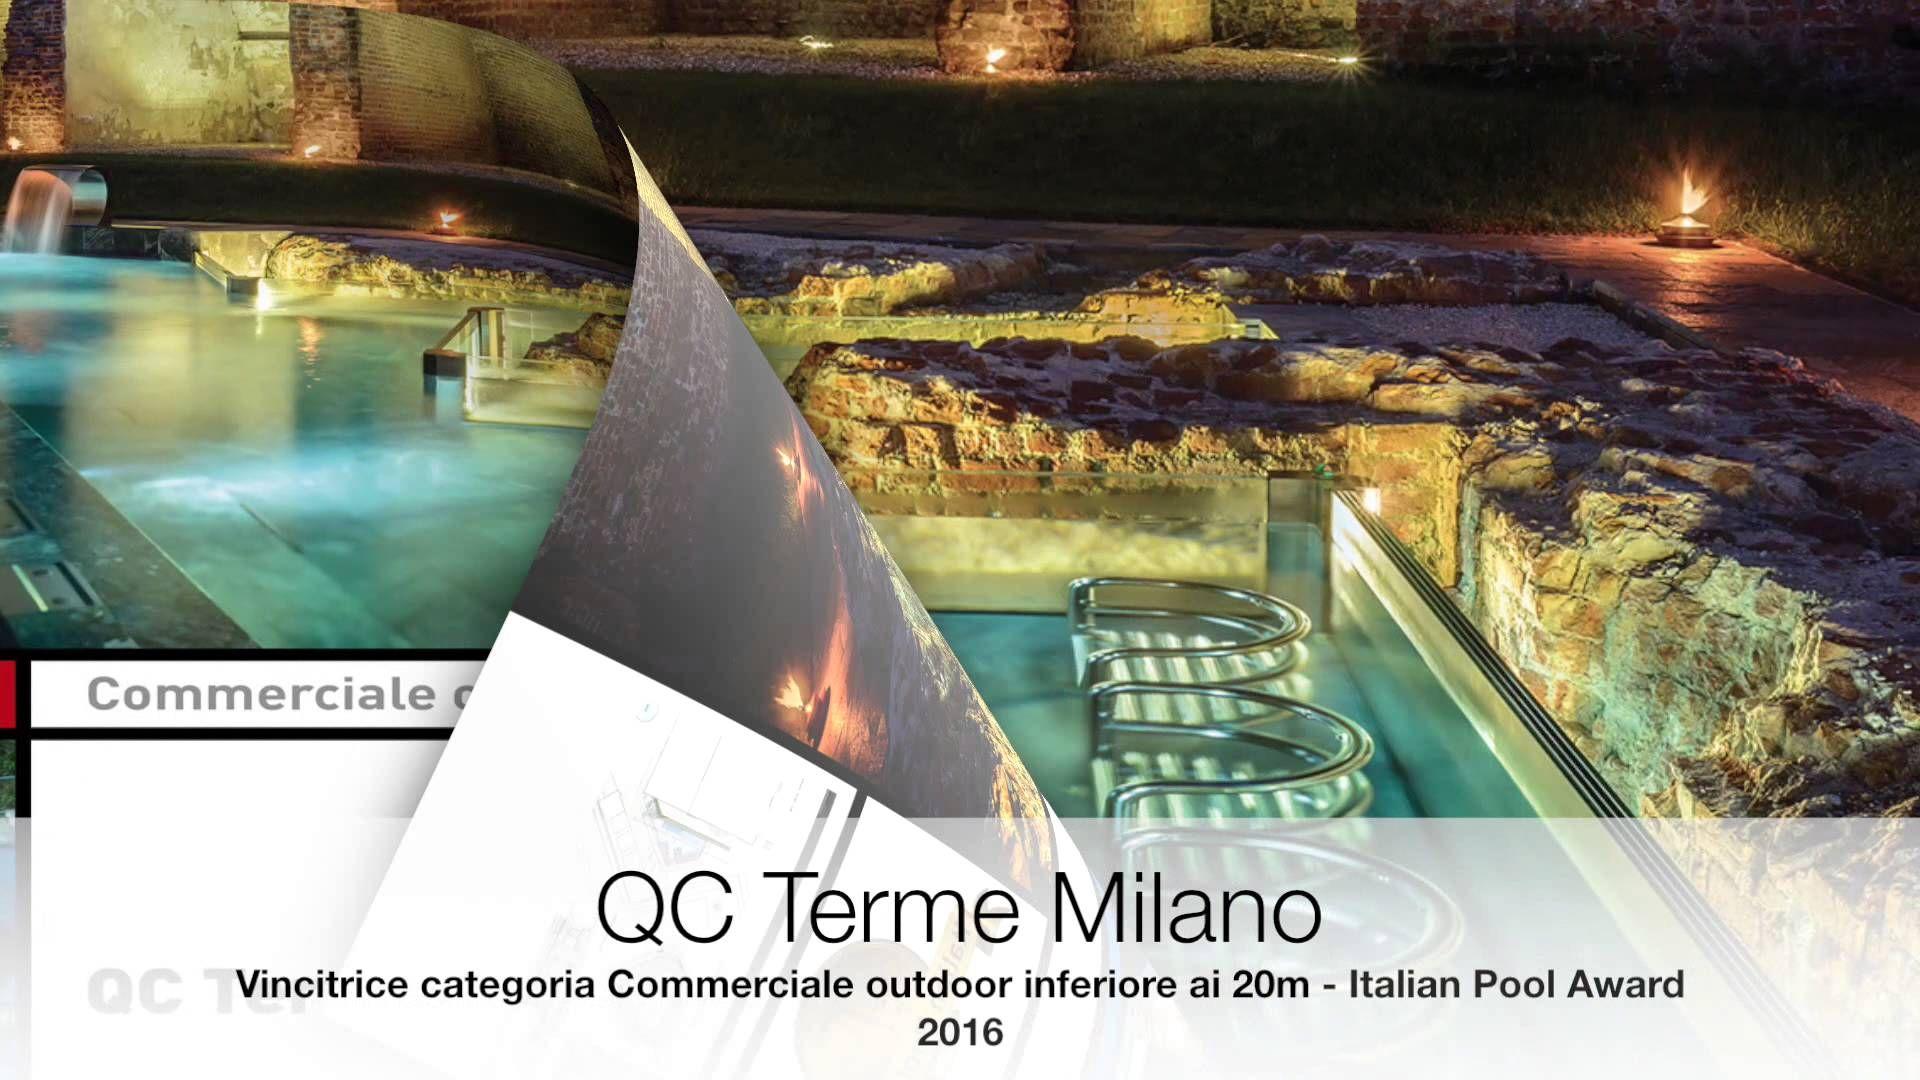 Video piscina commerciale outdoor inferiore a 20 metri vincitrice Italian Pool Award 2016. Piscina candidata da QC TermeMilano.